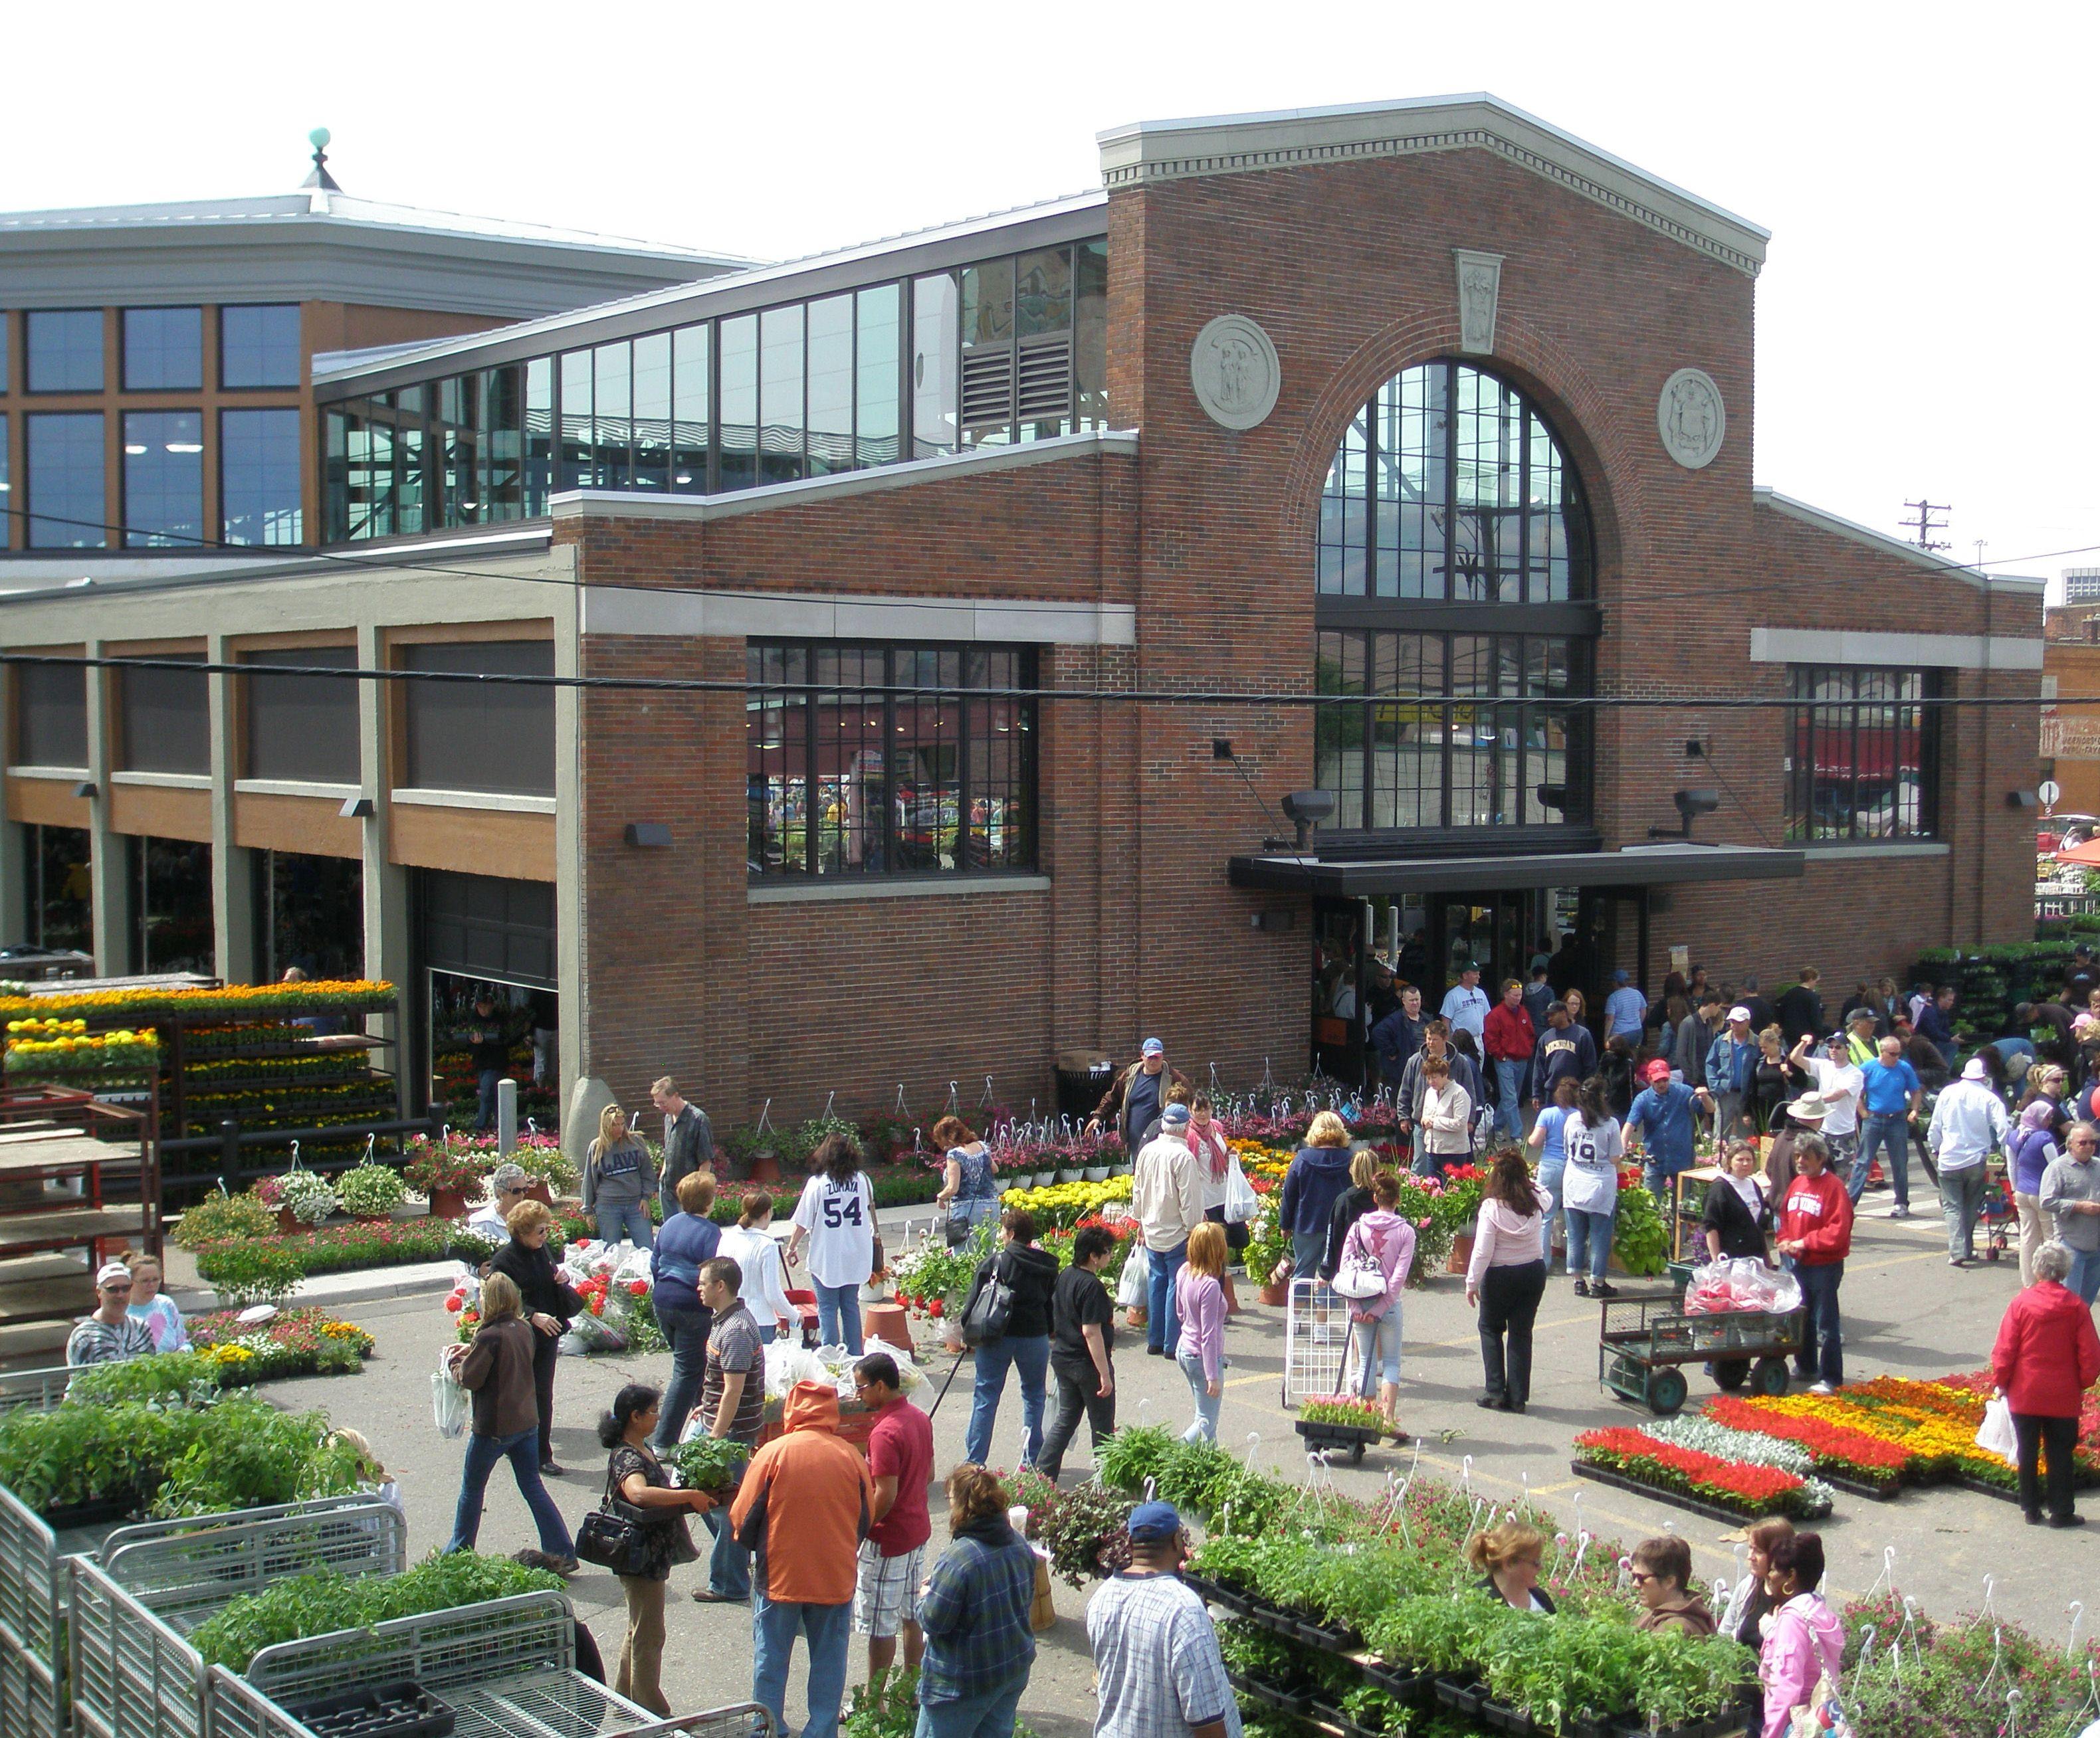 detroits historic eastern market - HD3160×2616